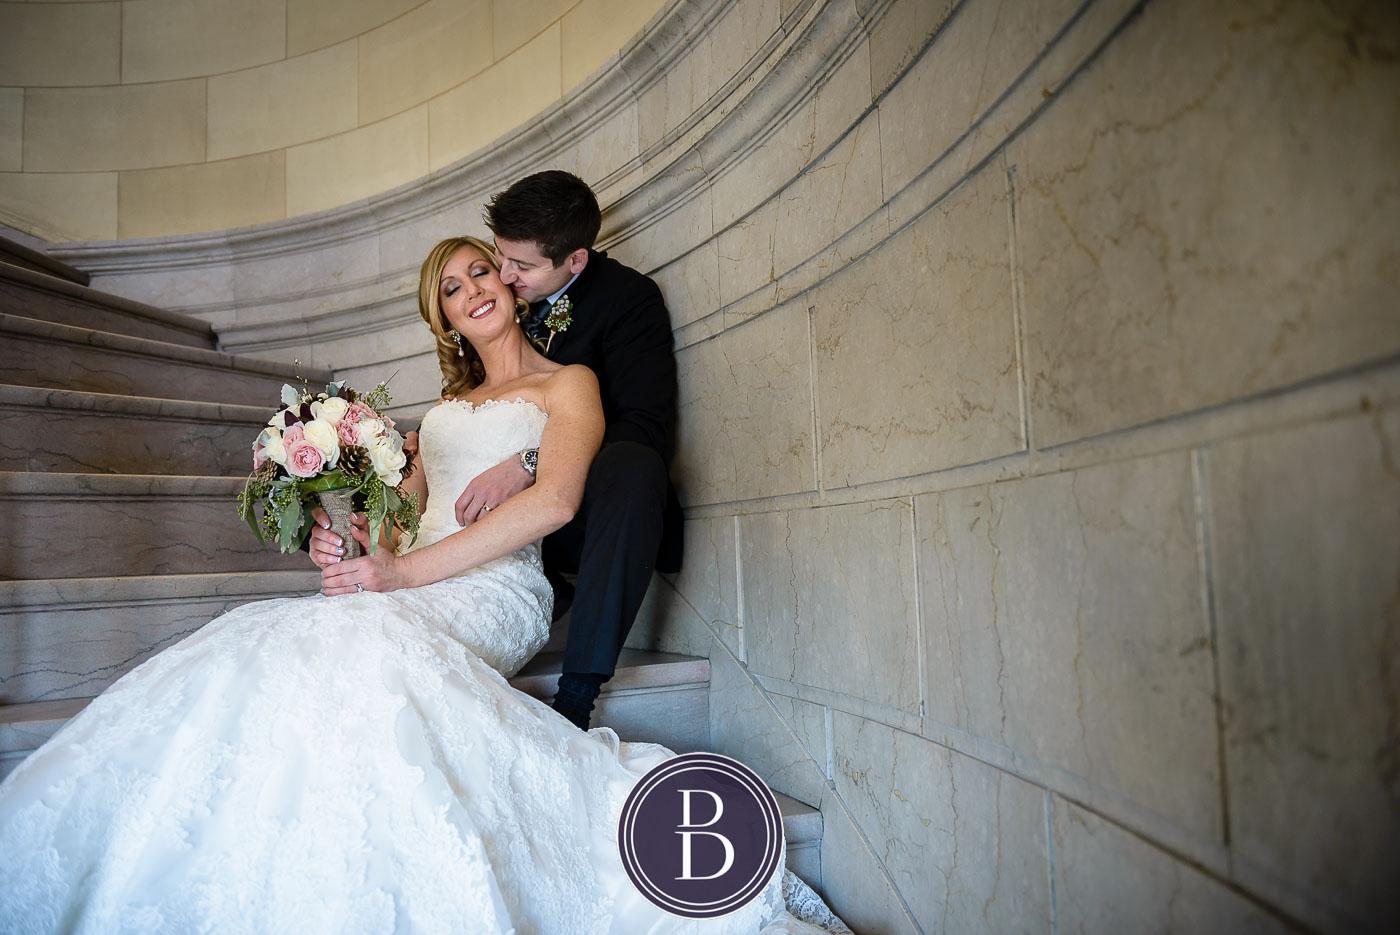 Romantic kiss bride groom Hamilton building stairs